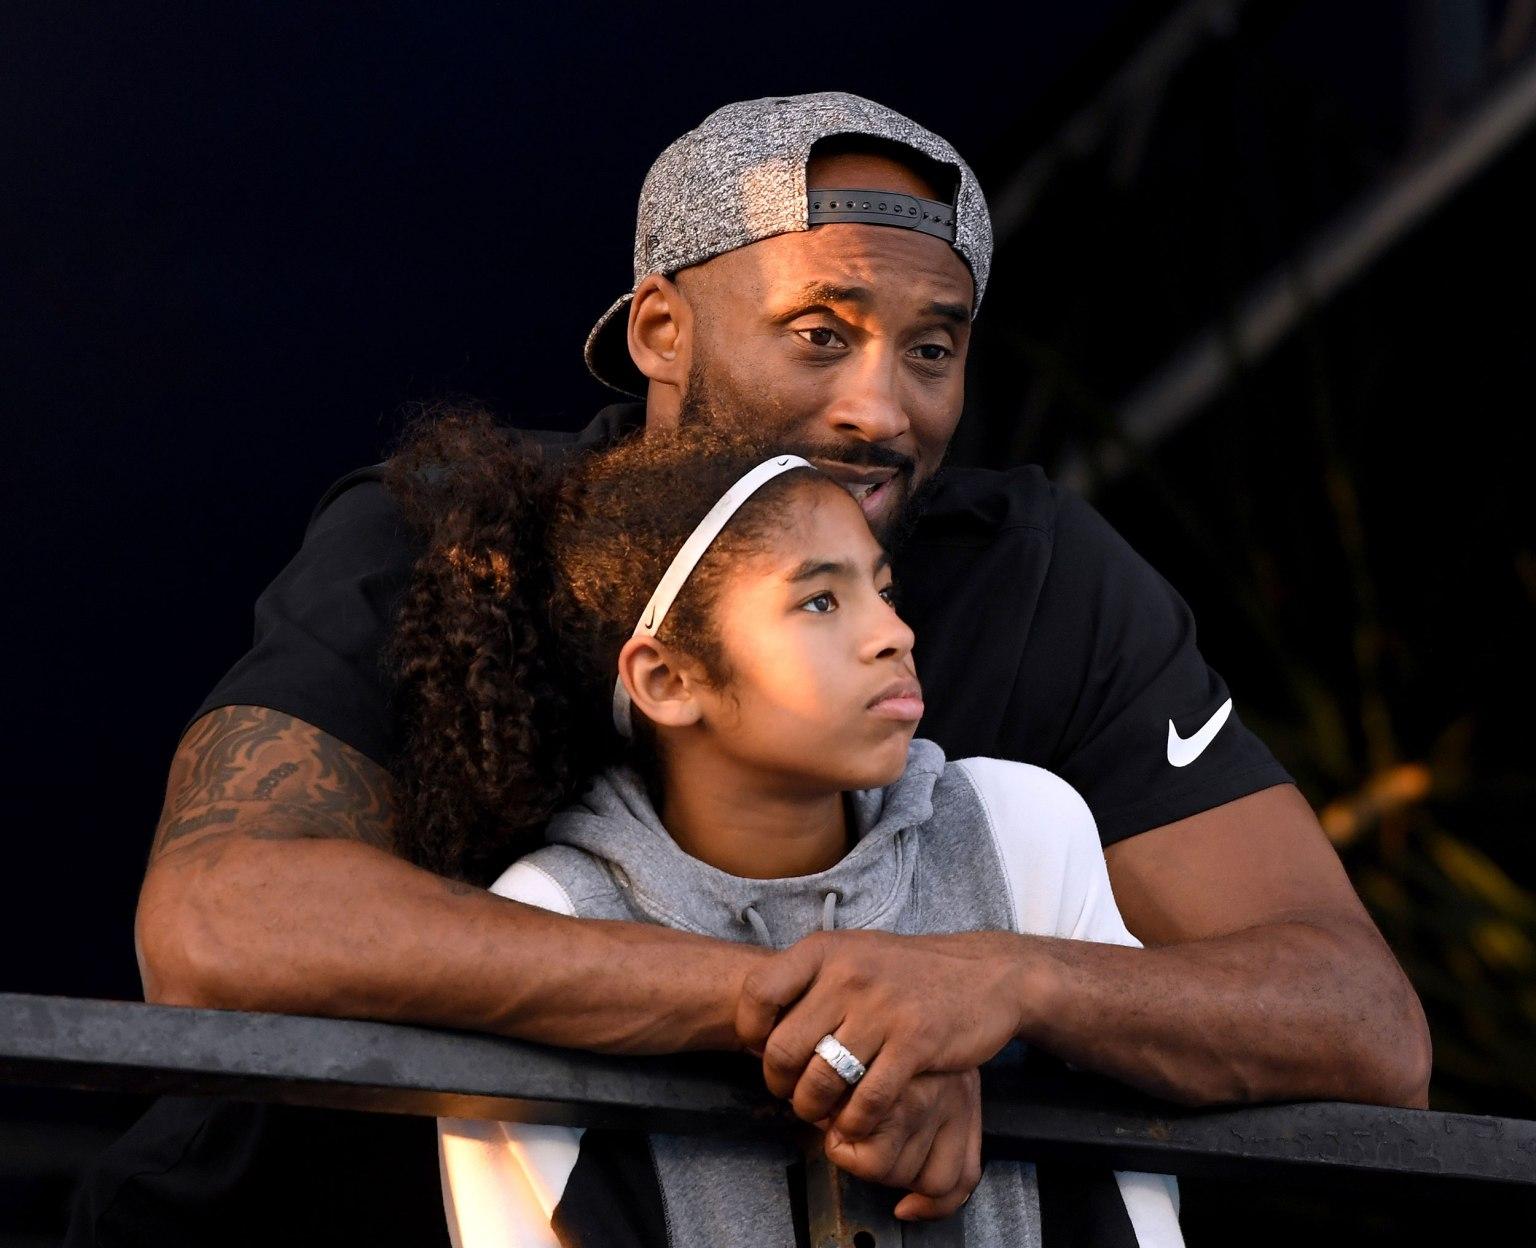 Tears, Memories Flow at Staples Center in Emotional Kobe Bryant Tribute